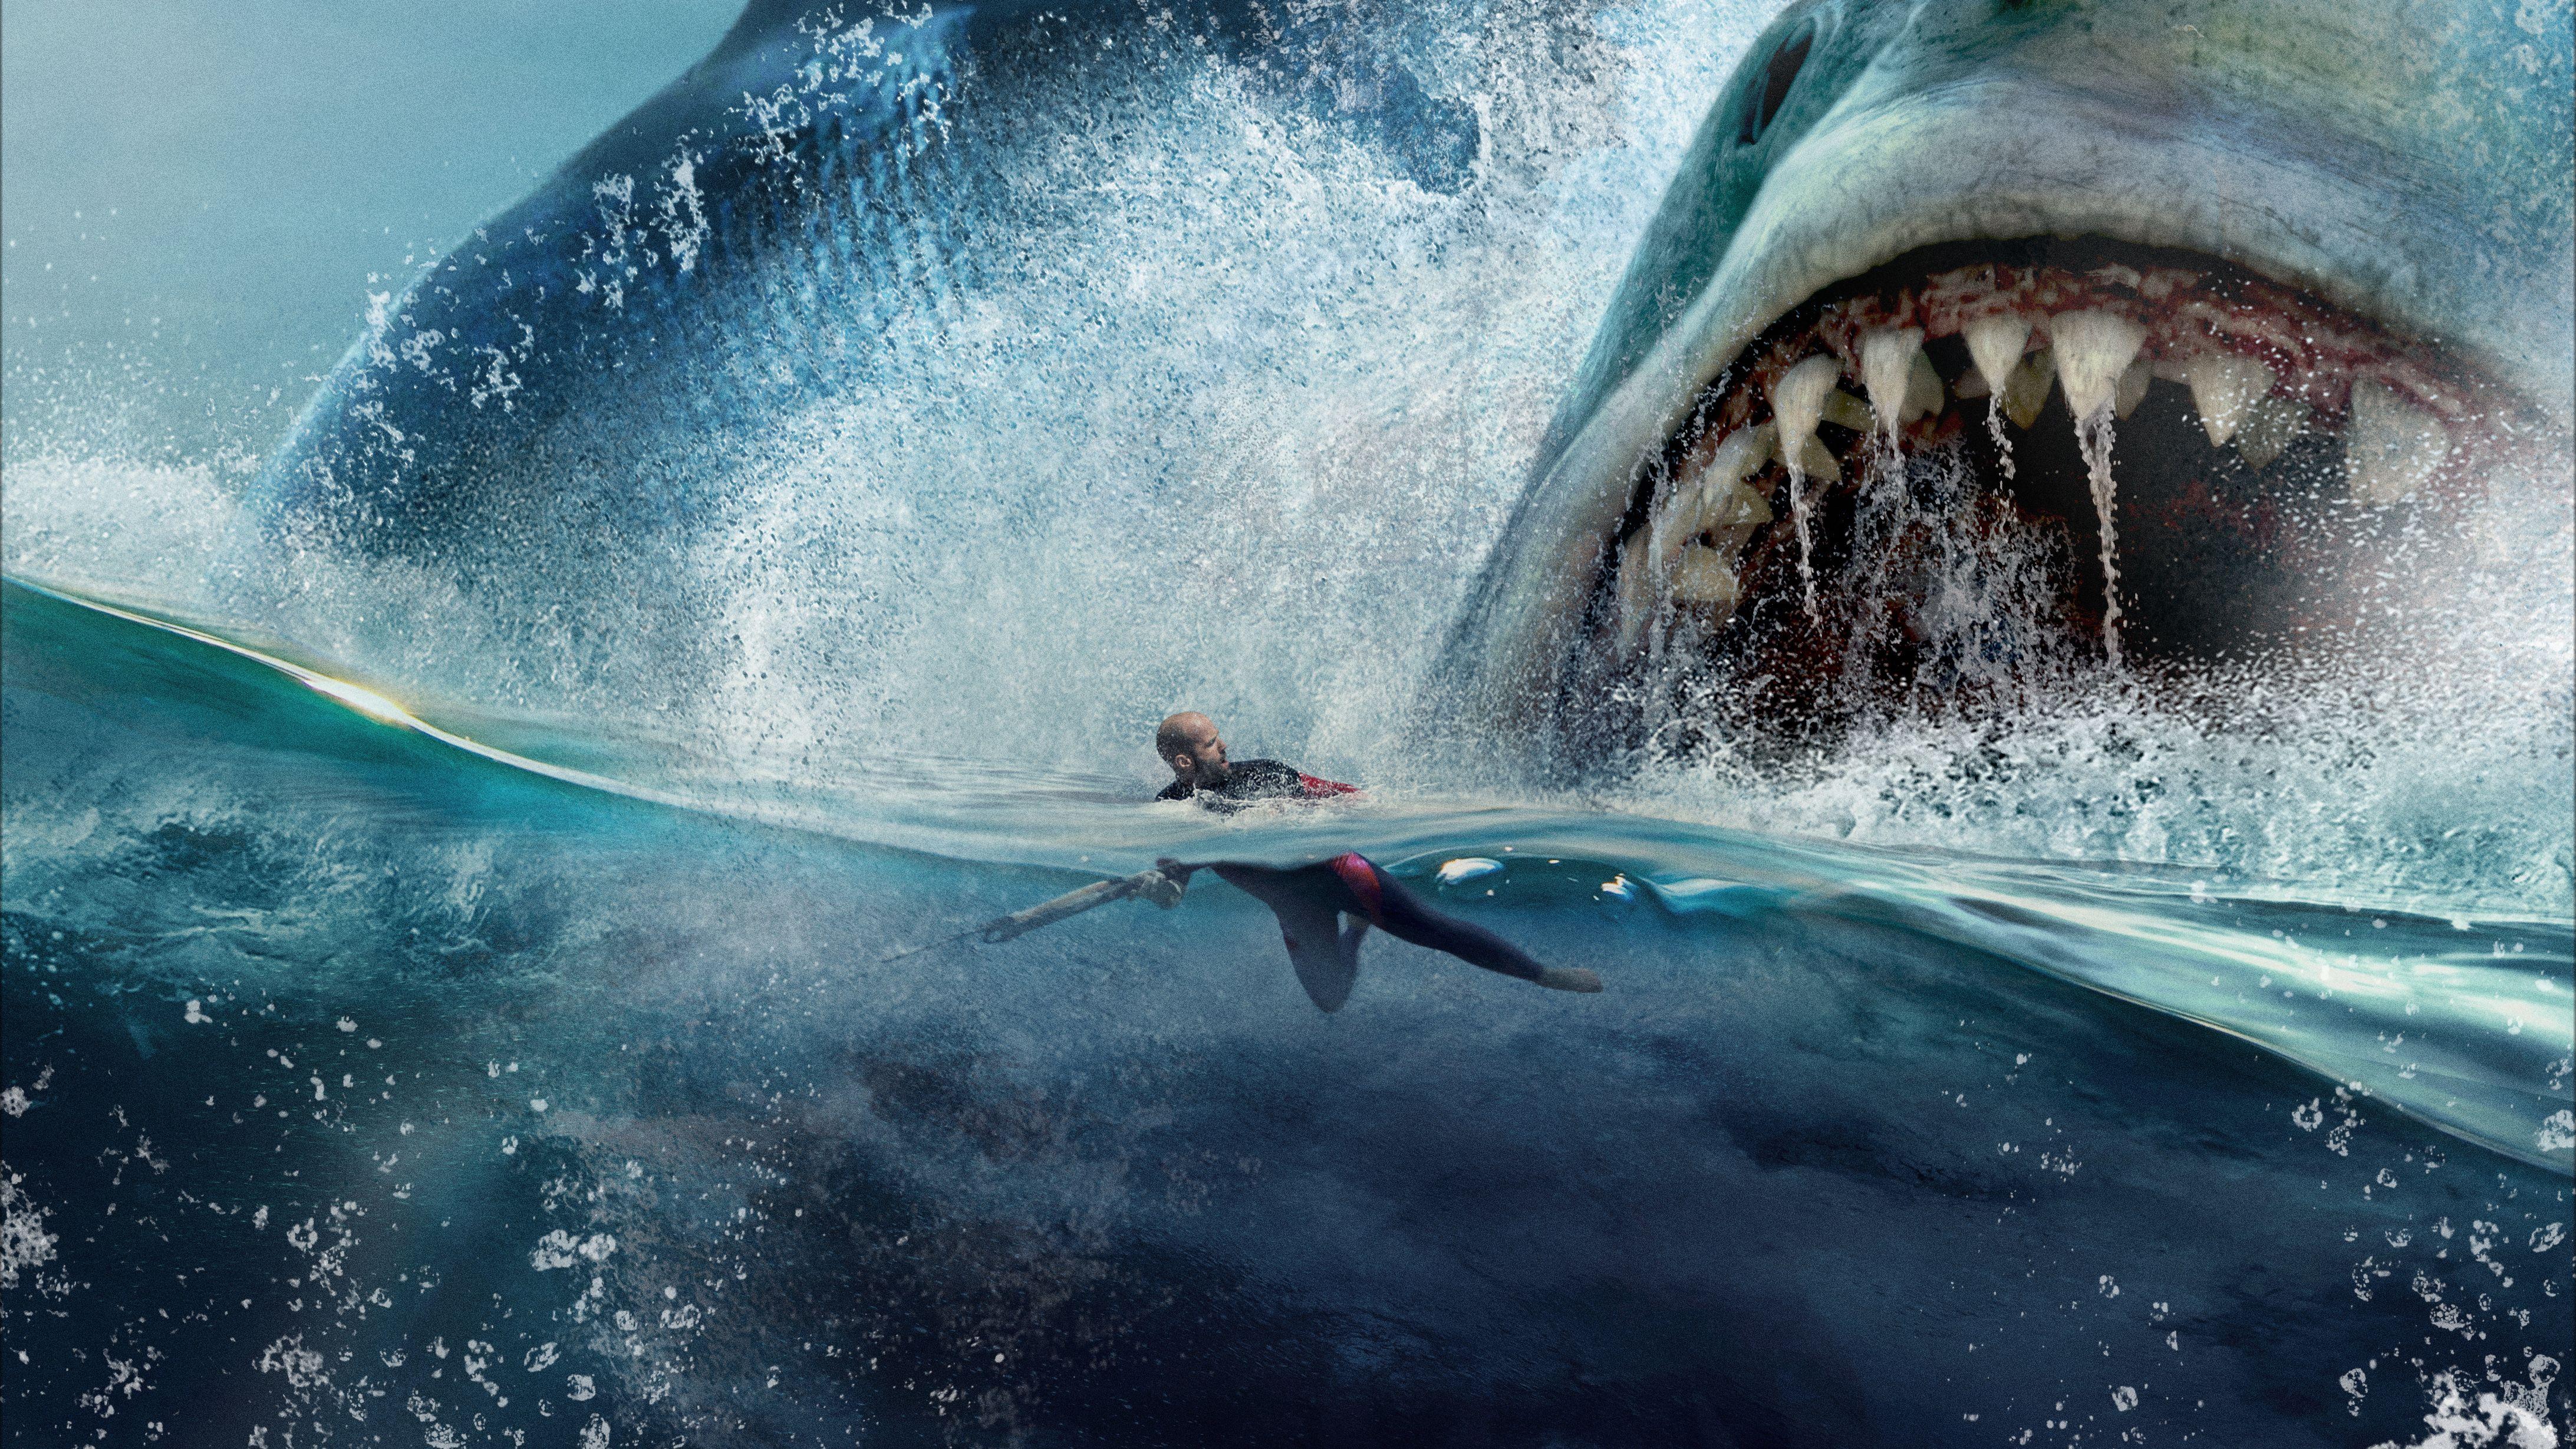 Jason Statham In The Meg 4k Megalodon Imagenes De Tiburones Peliculas En Linea Gratis